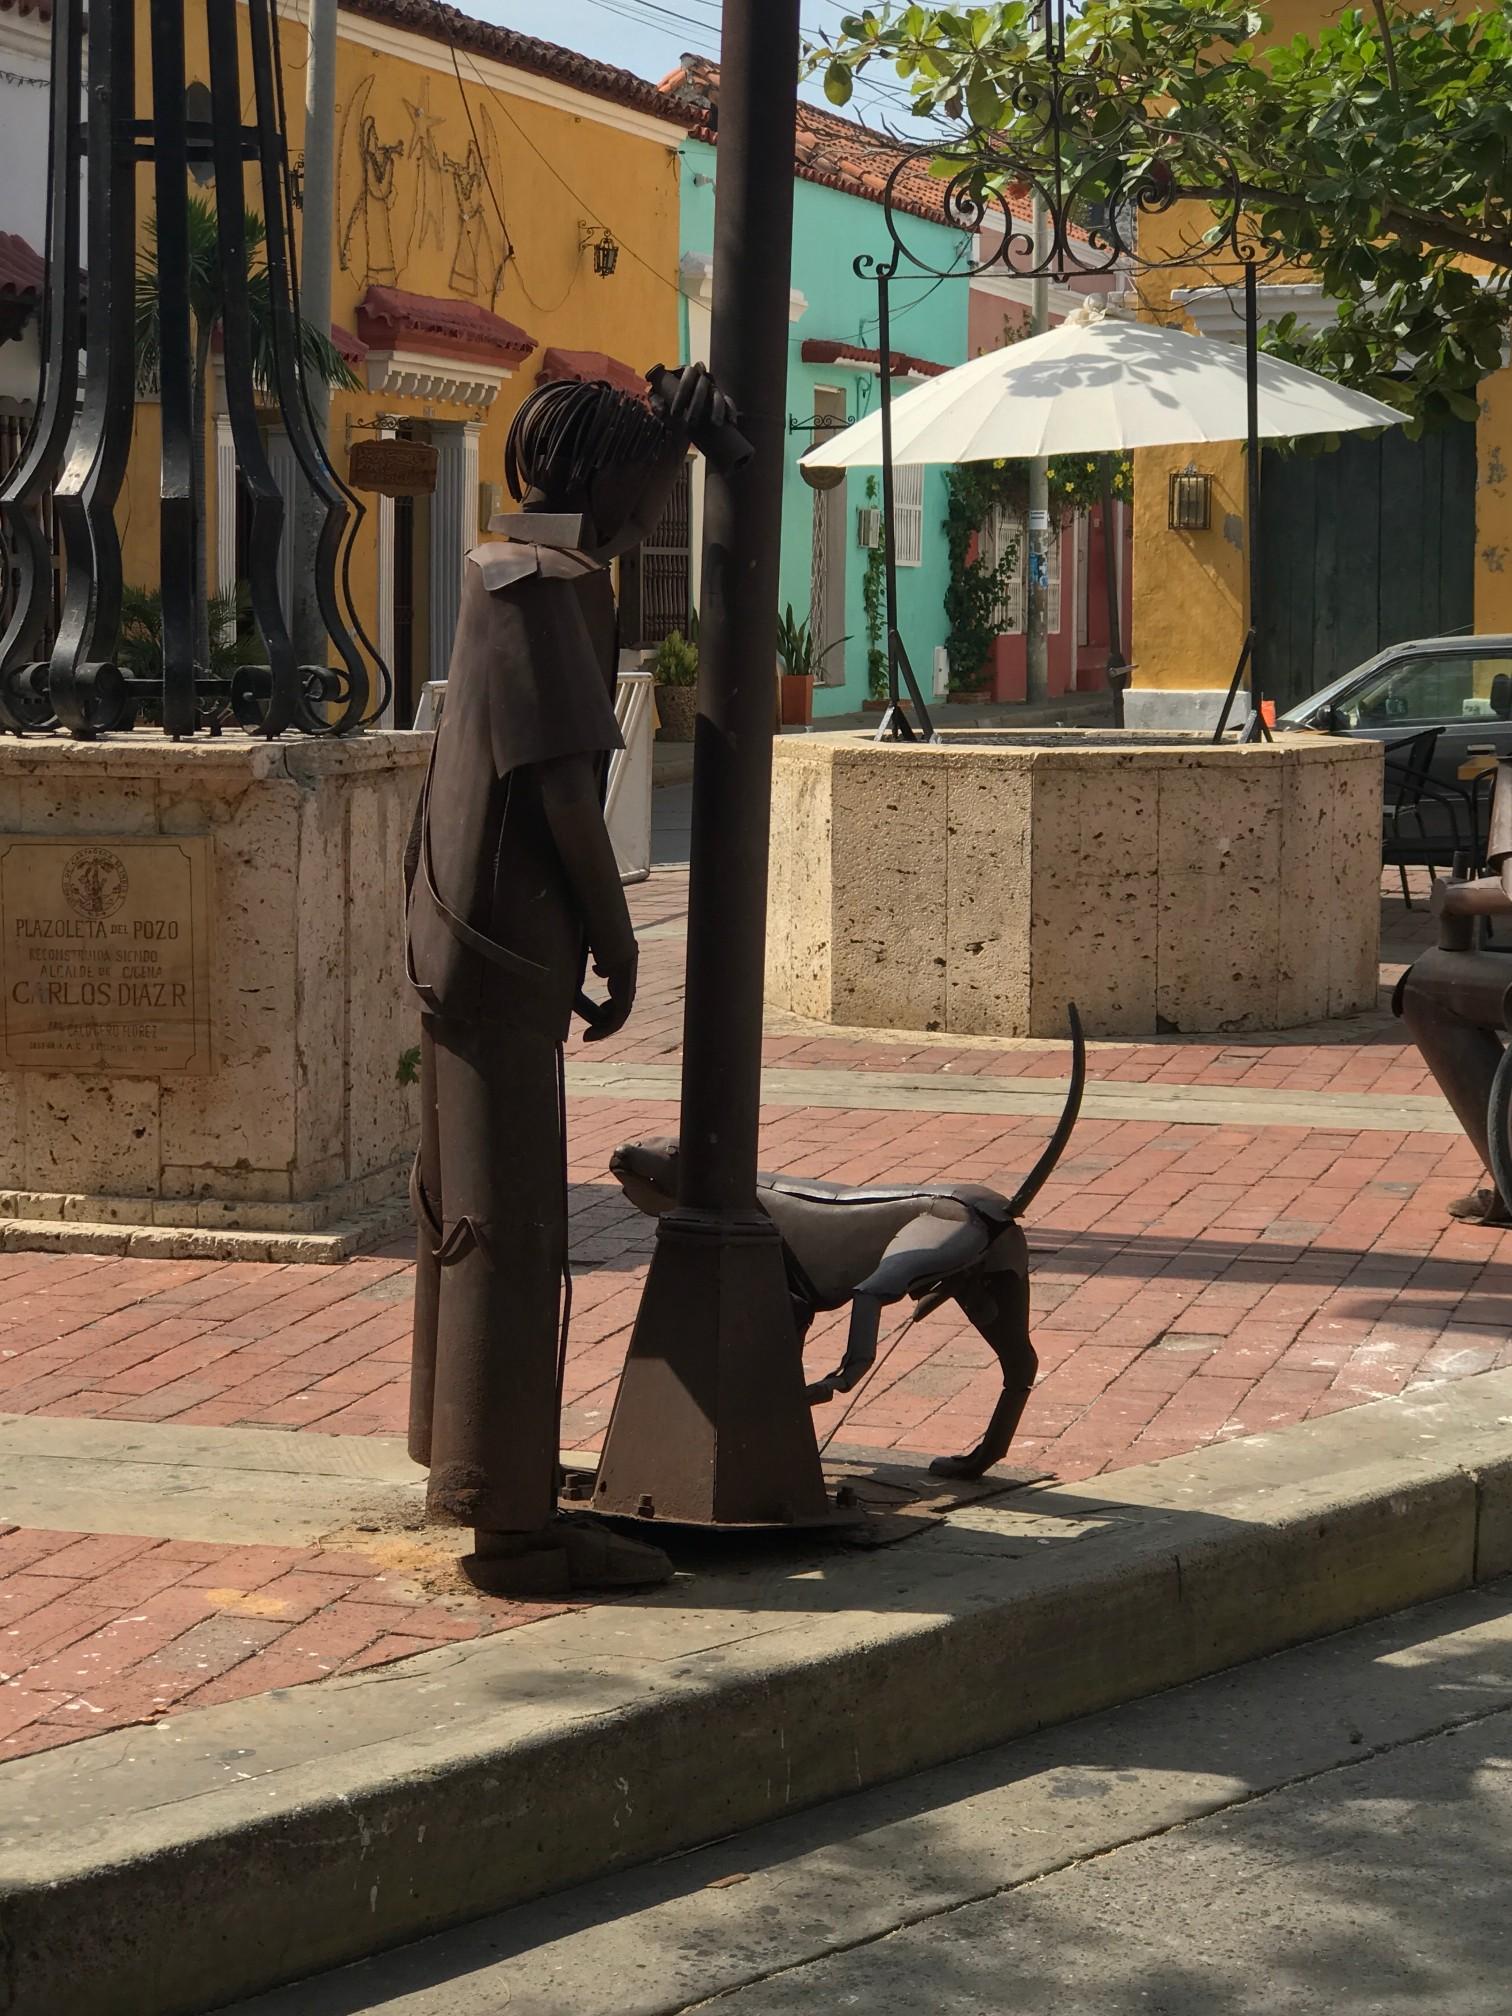 dog and man pee art.jpg